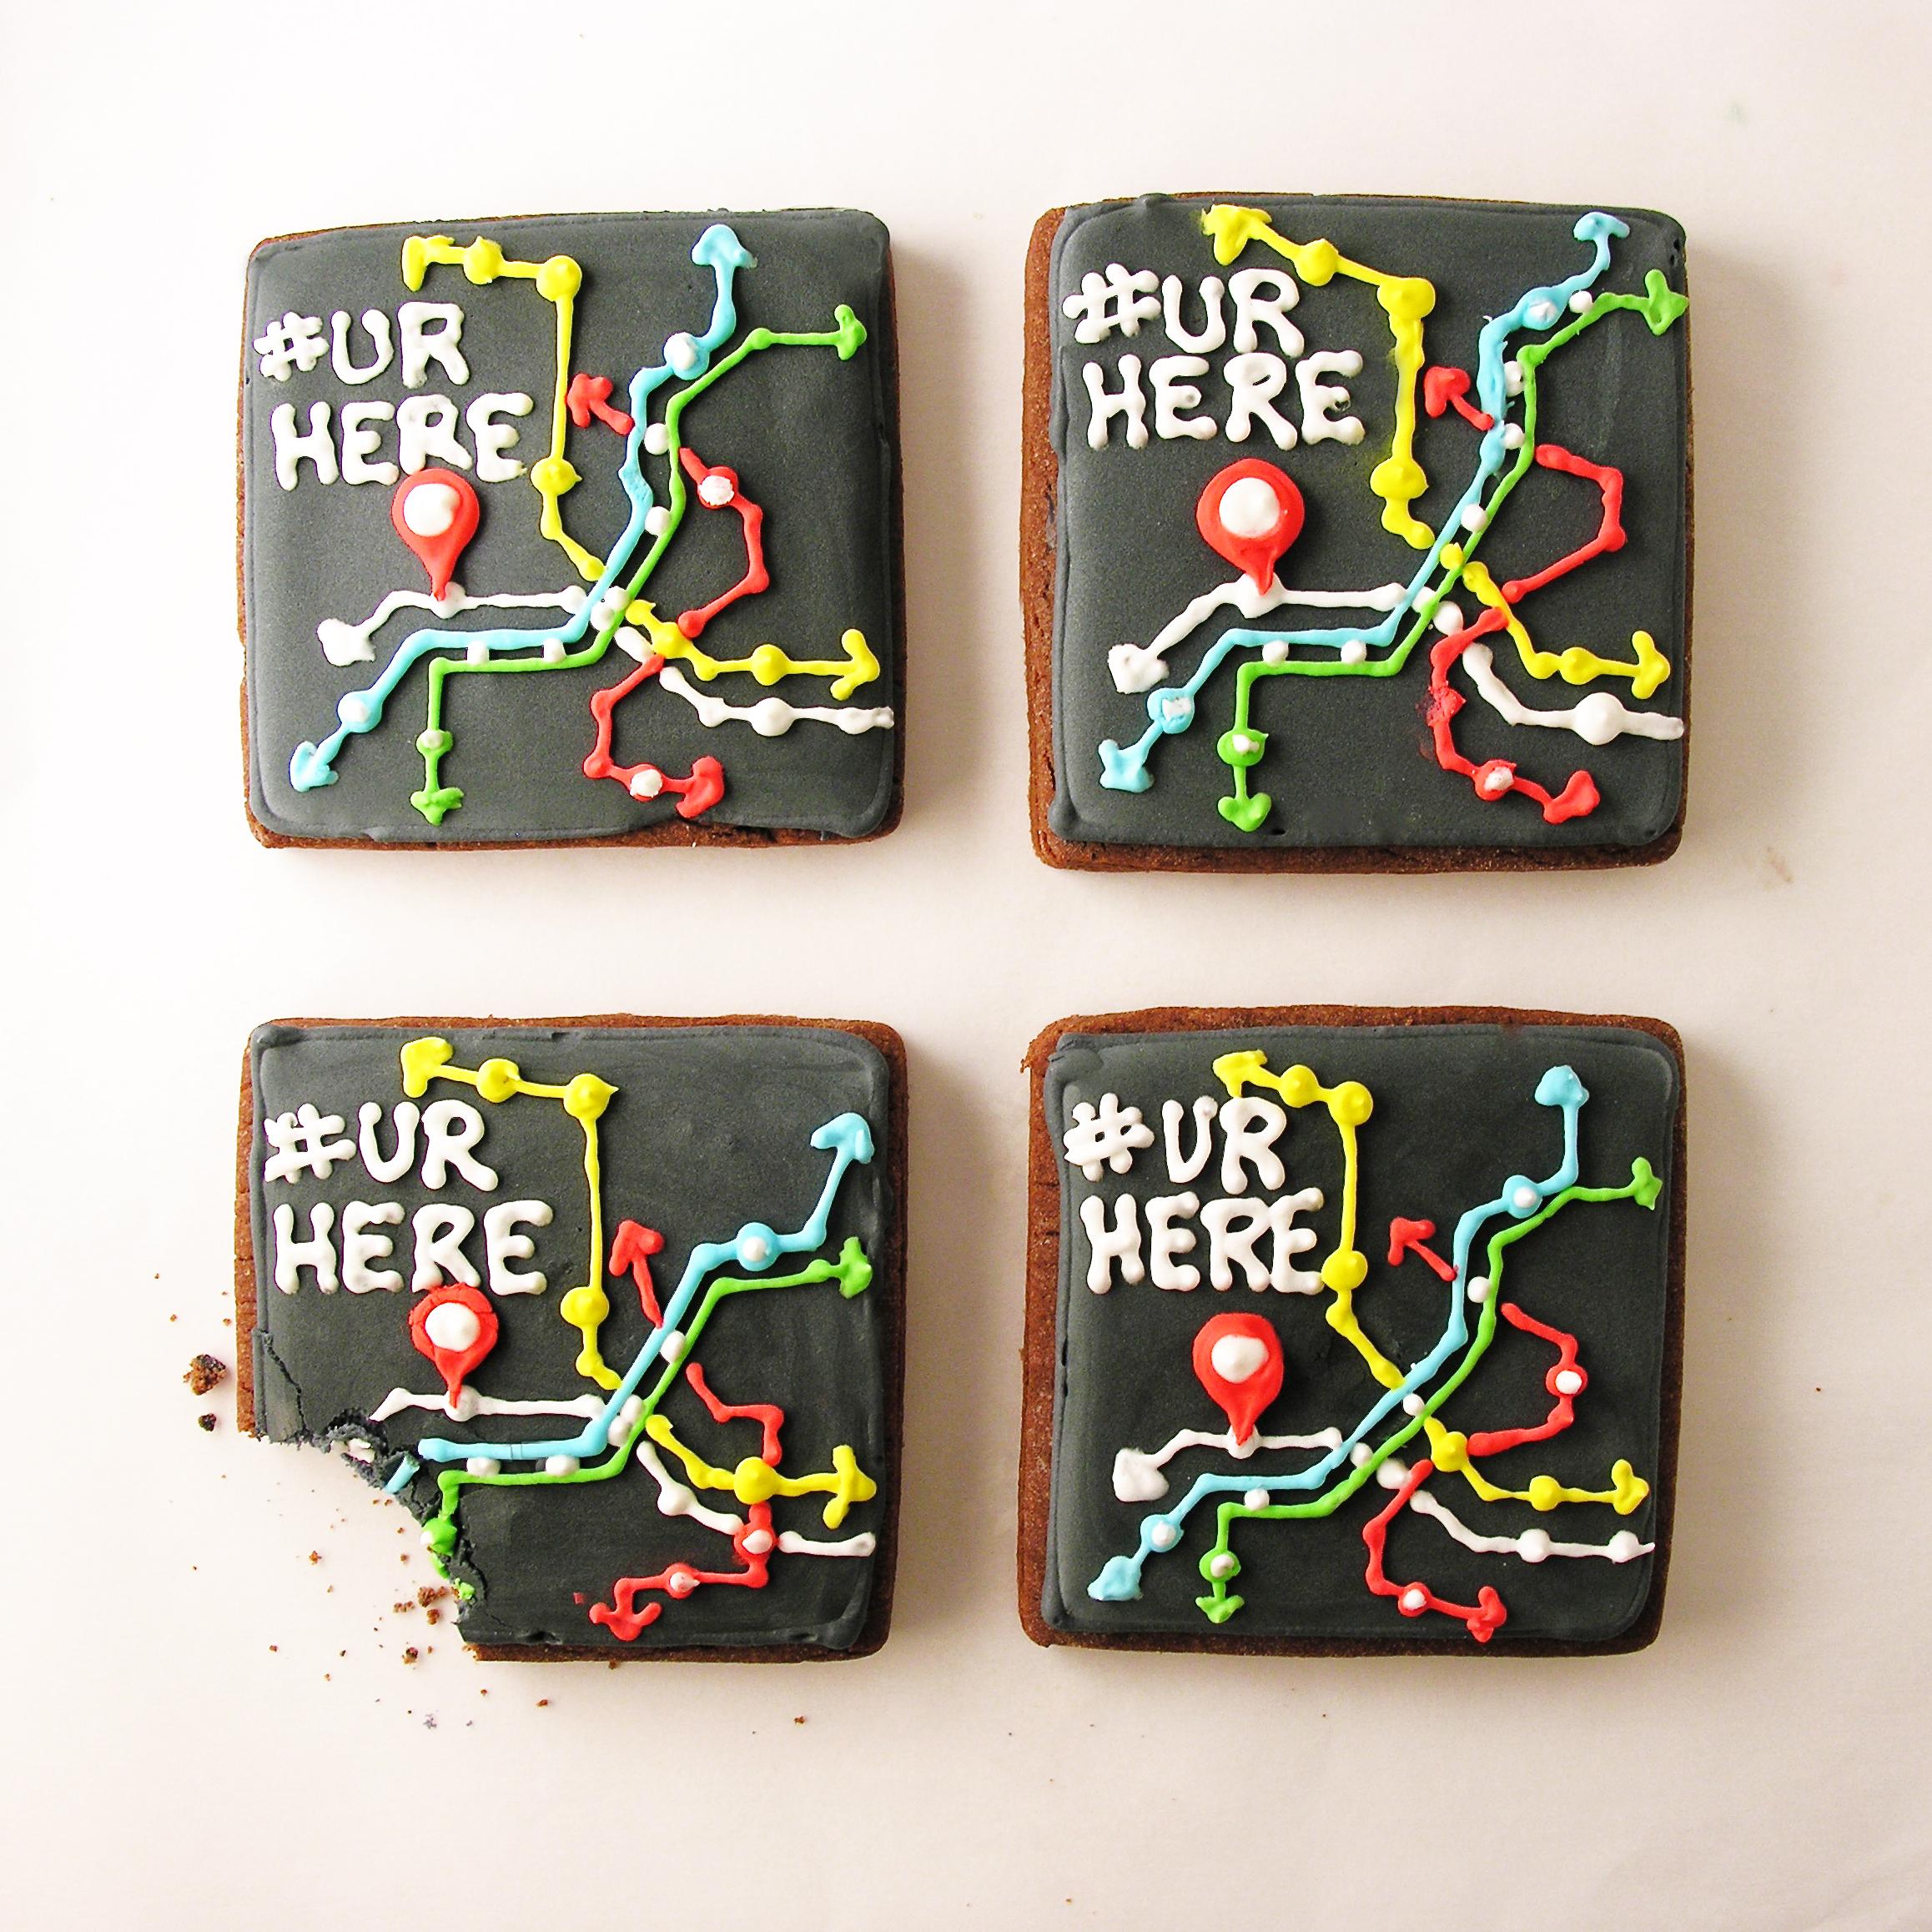 URHERE Cookies3